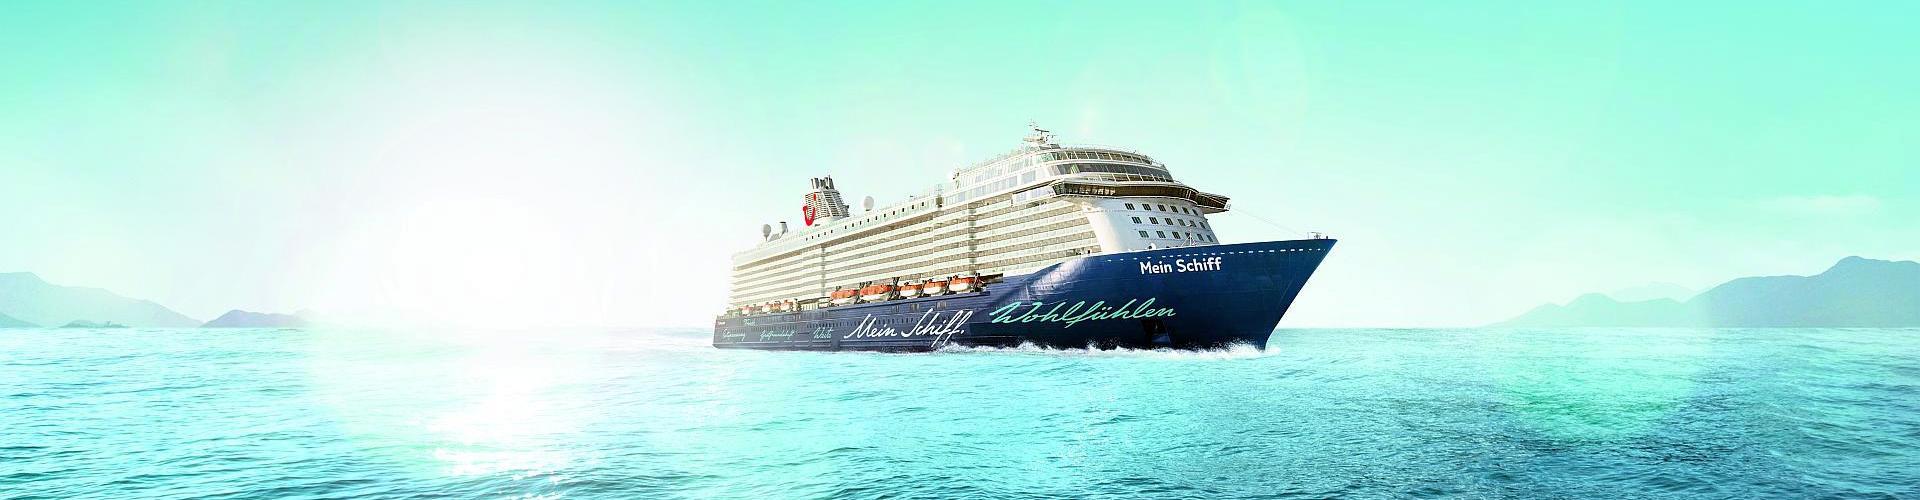 TUI Cruises Kreuzfahrt mit Mein Schiff